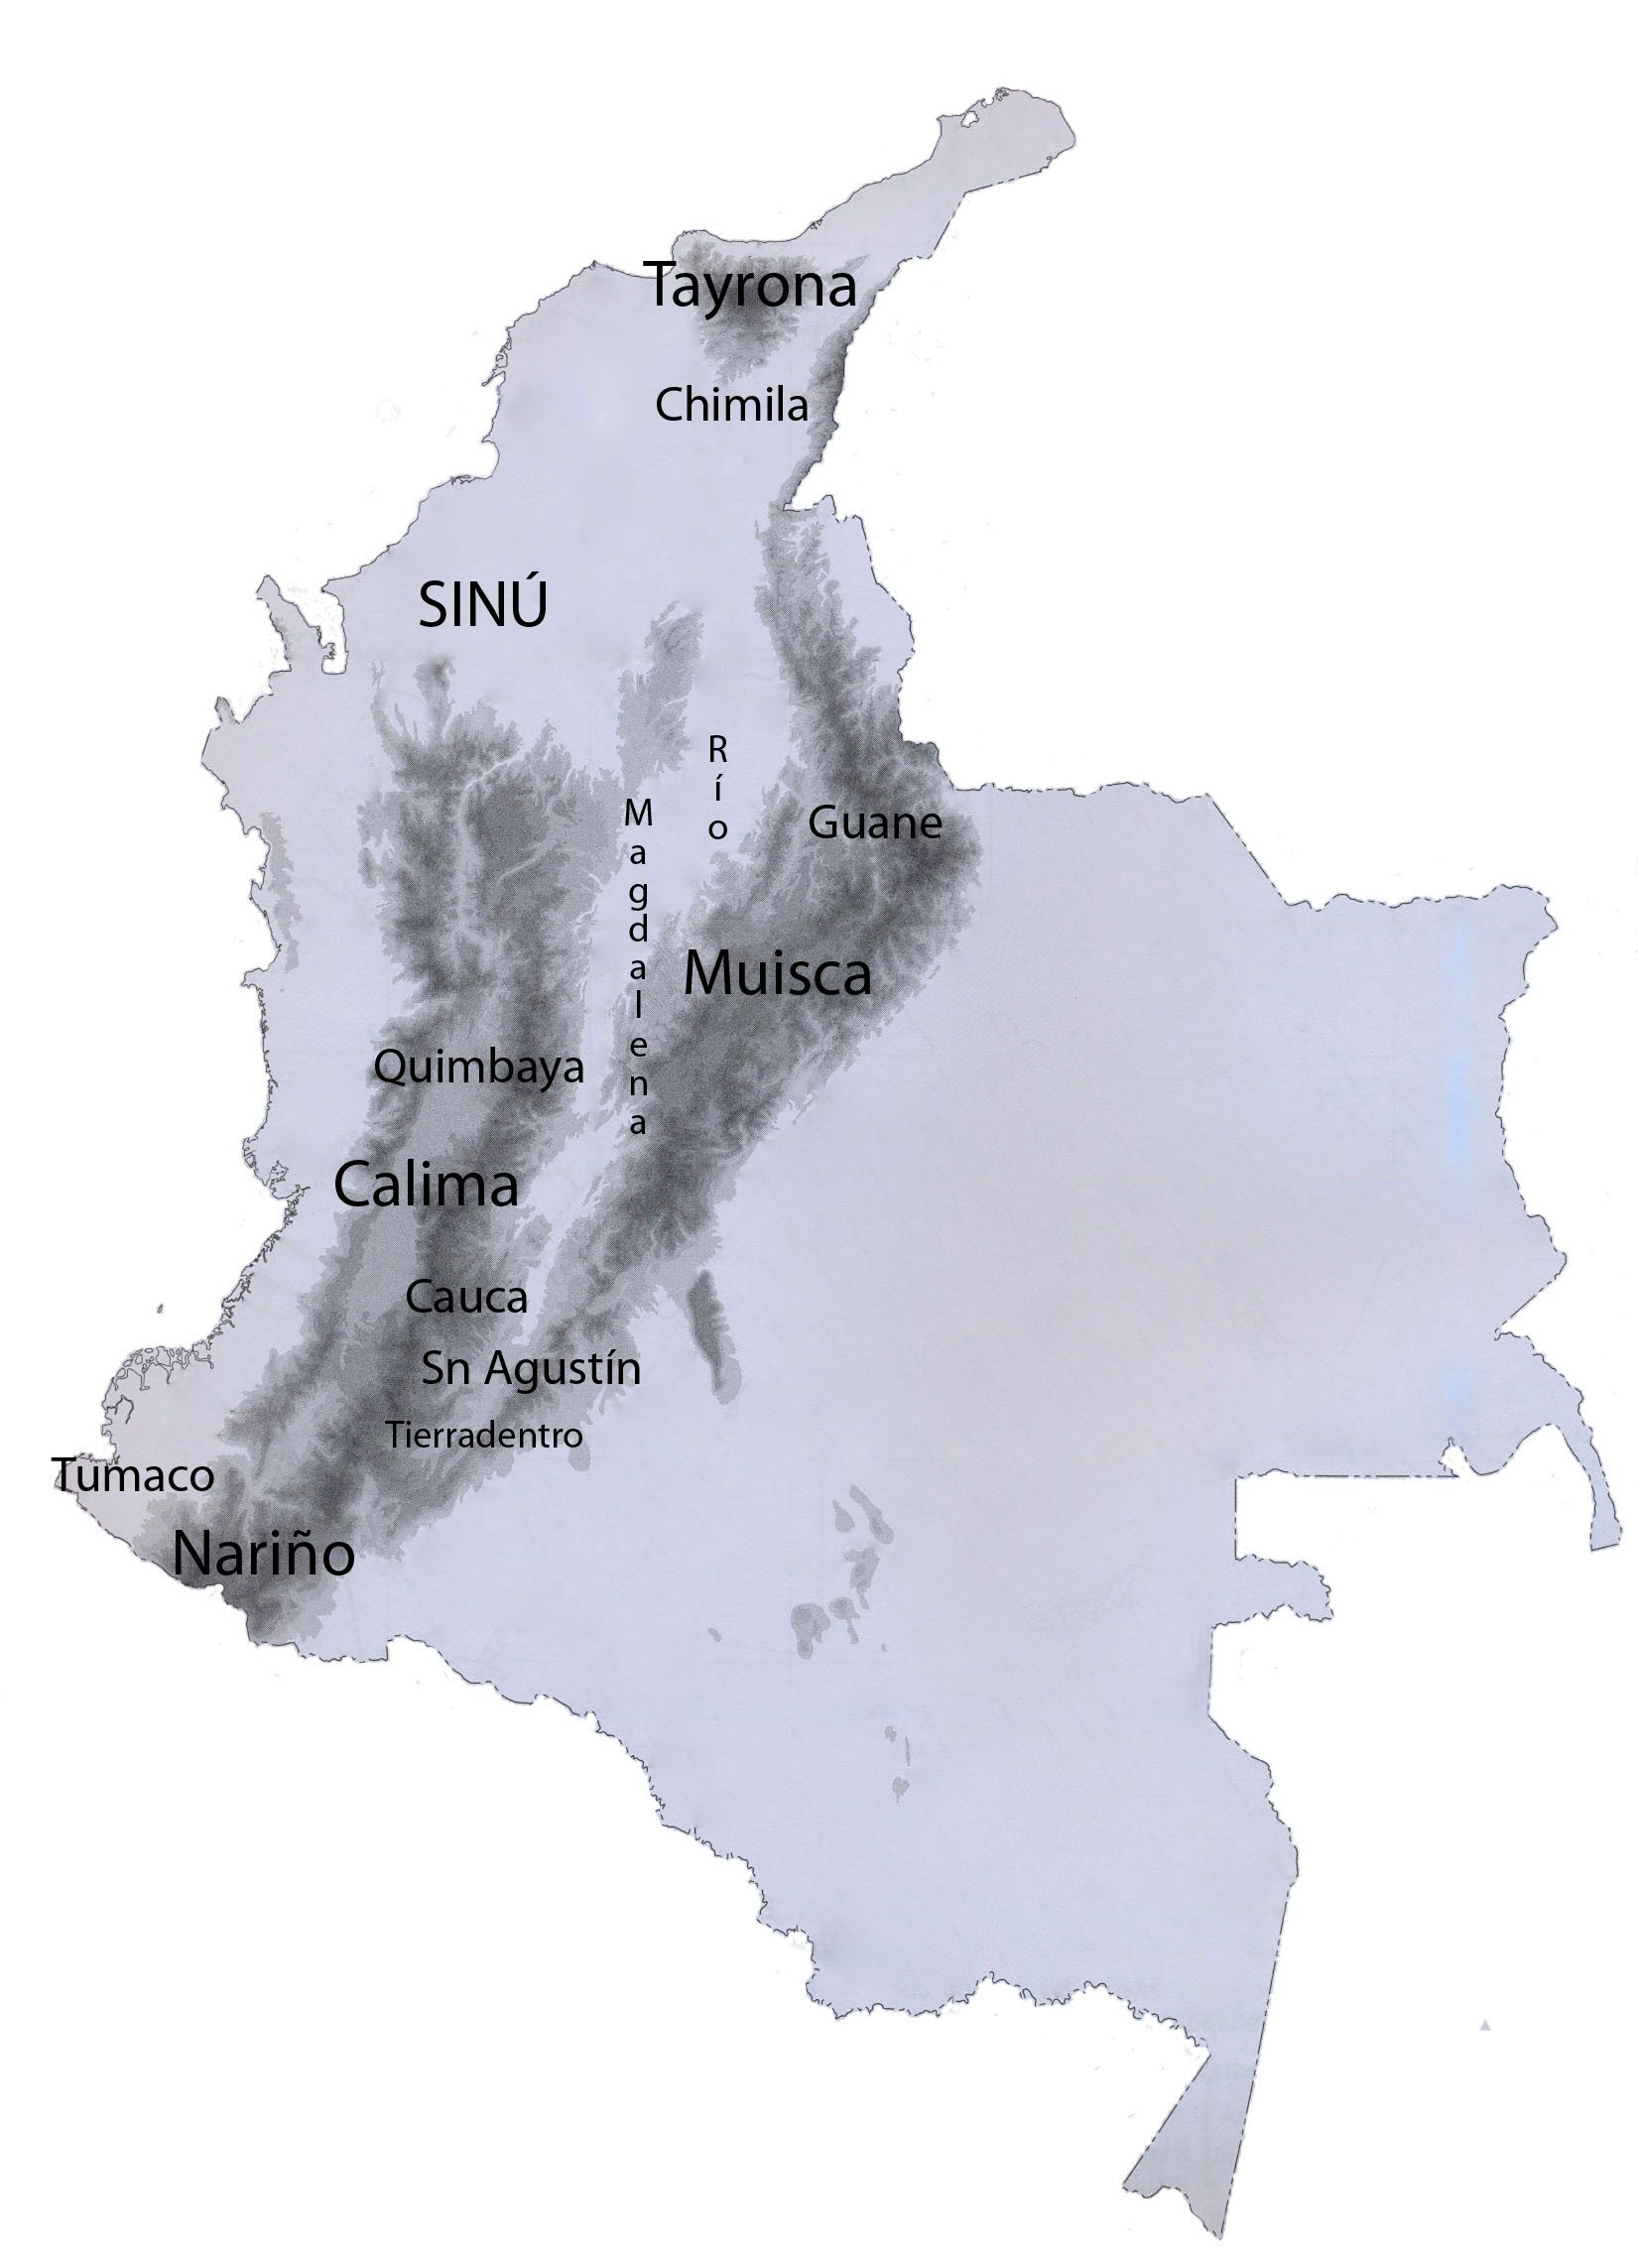 Colombia sur amrica zonas arqueolgicas otra mirada a colombia y colombia sur amrica zonas arqueolgicas otra mirada a colombia y amrica latina a fandeluxe Images